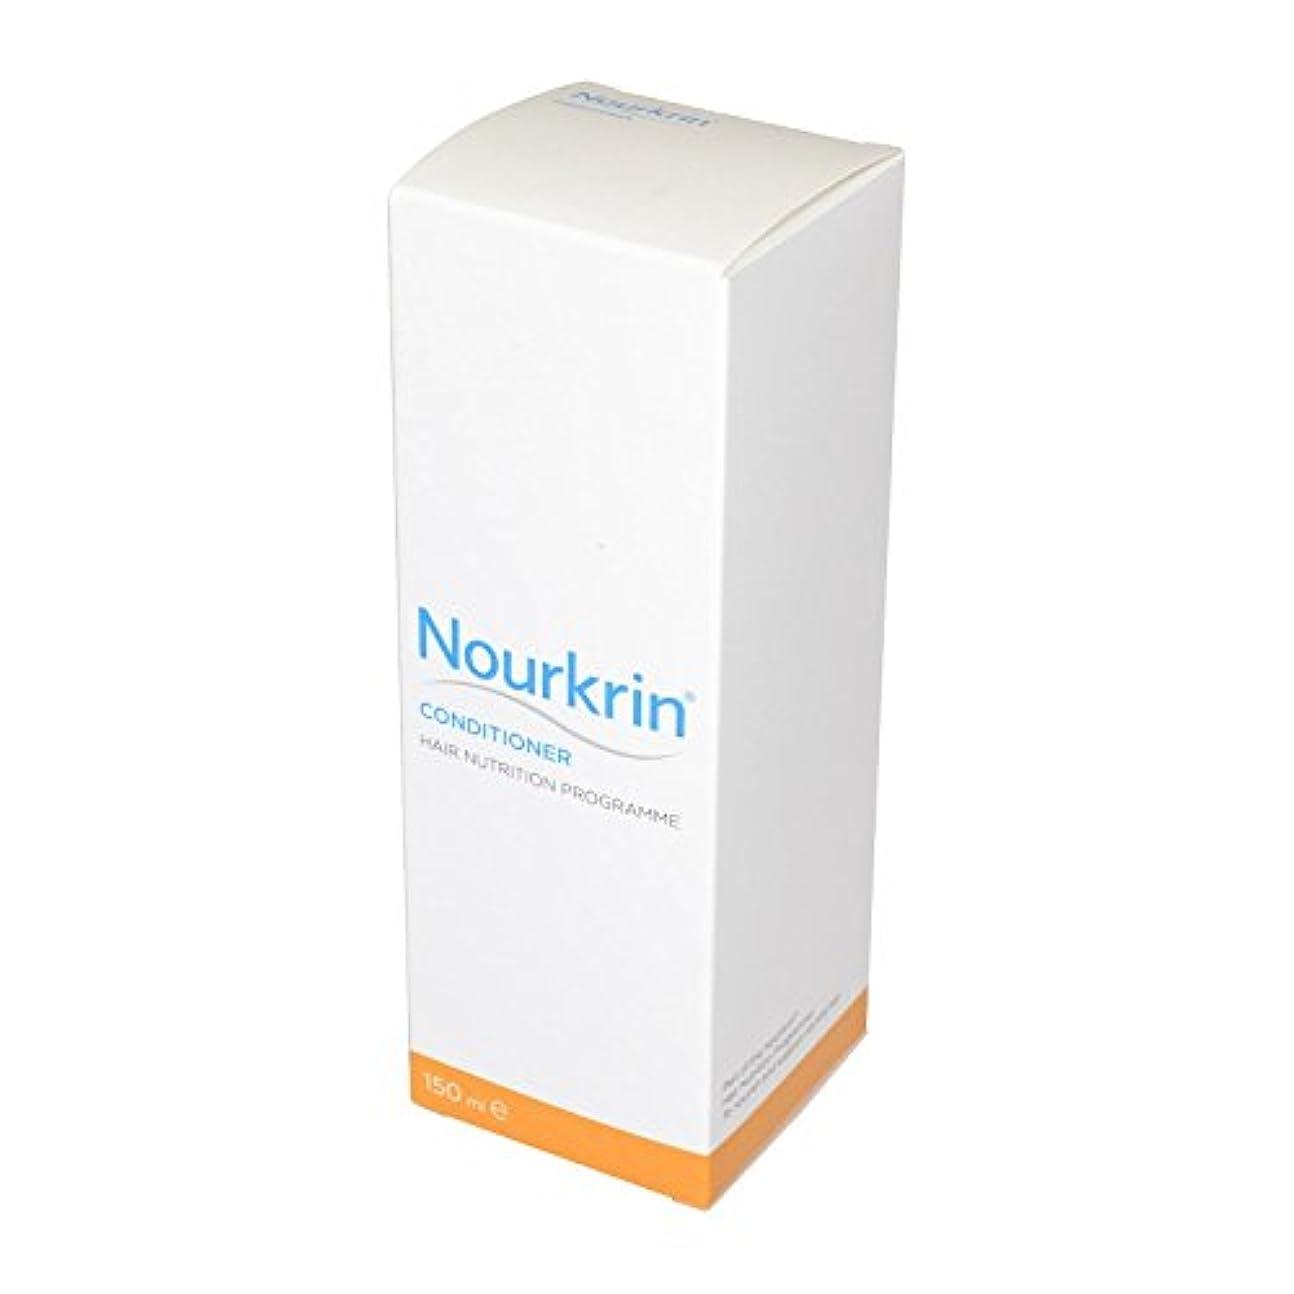 Nourkrin Conditioner (Pack of 6) - Nourkrinコンディショナー (x6) [並行輸入品]